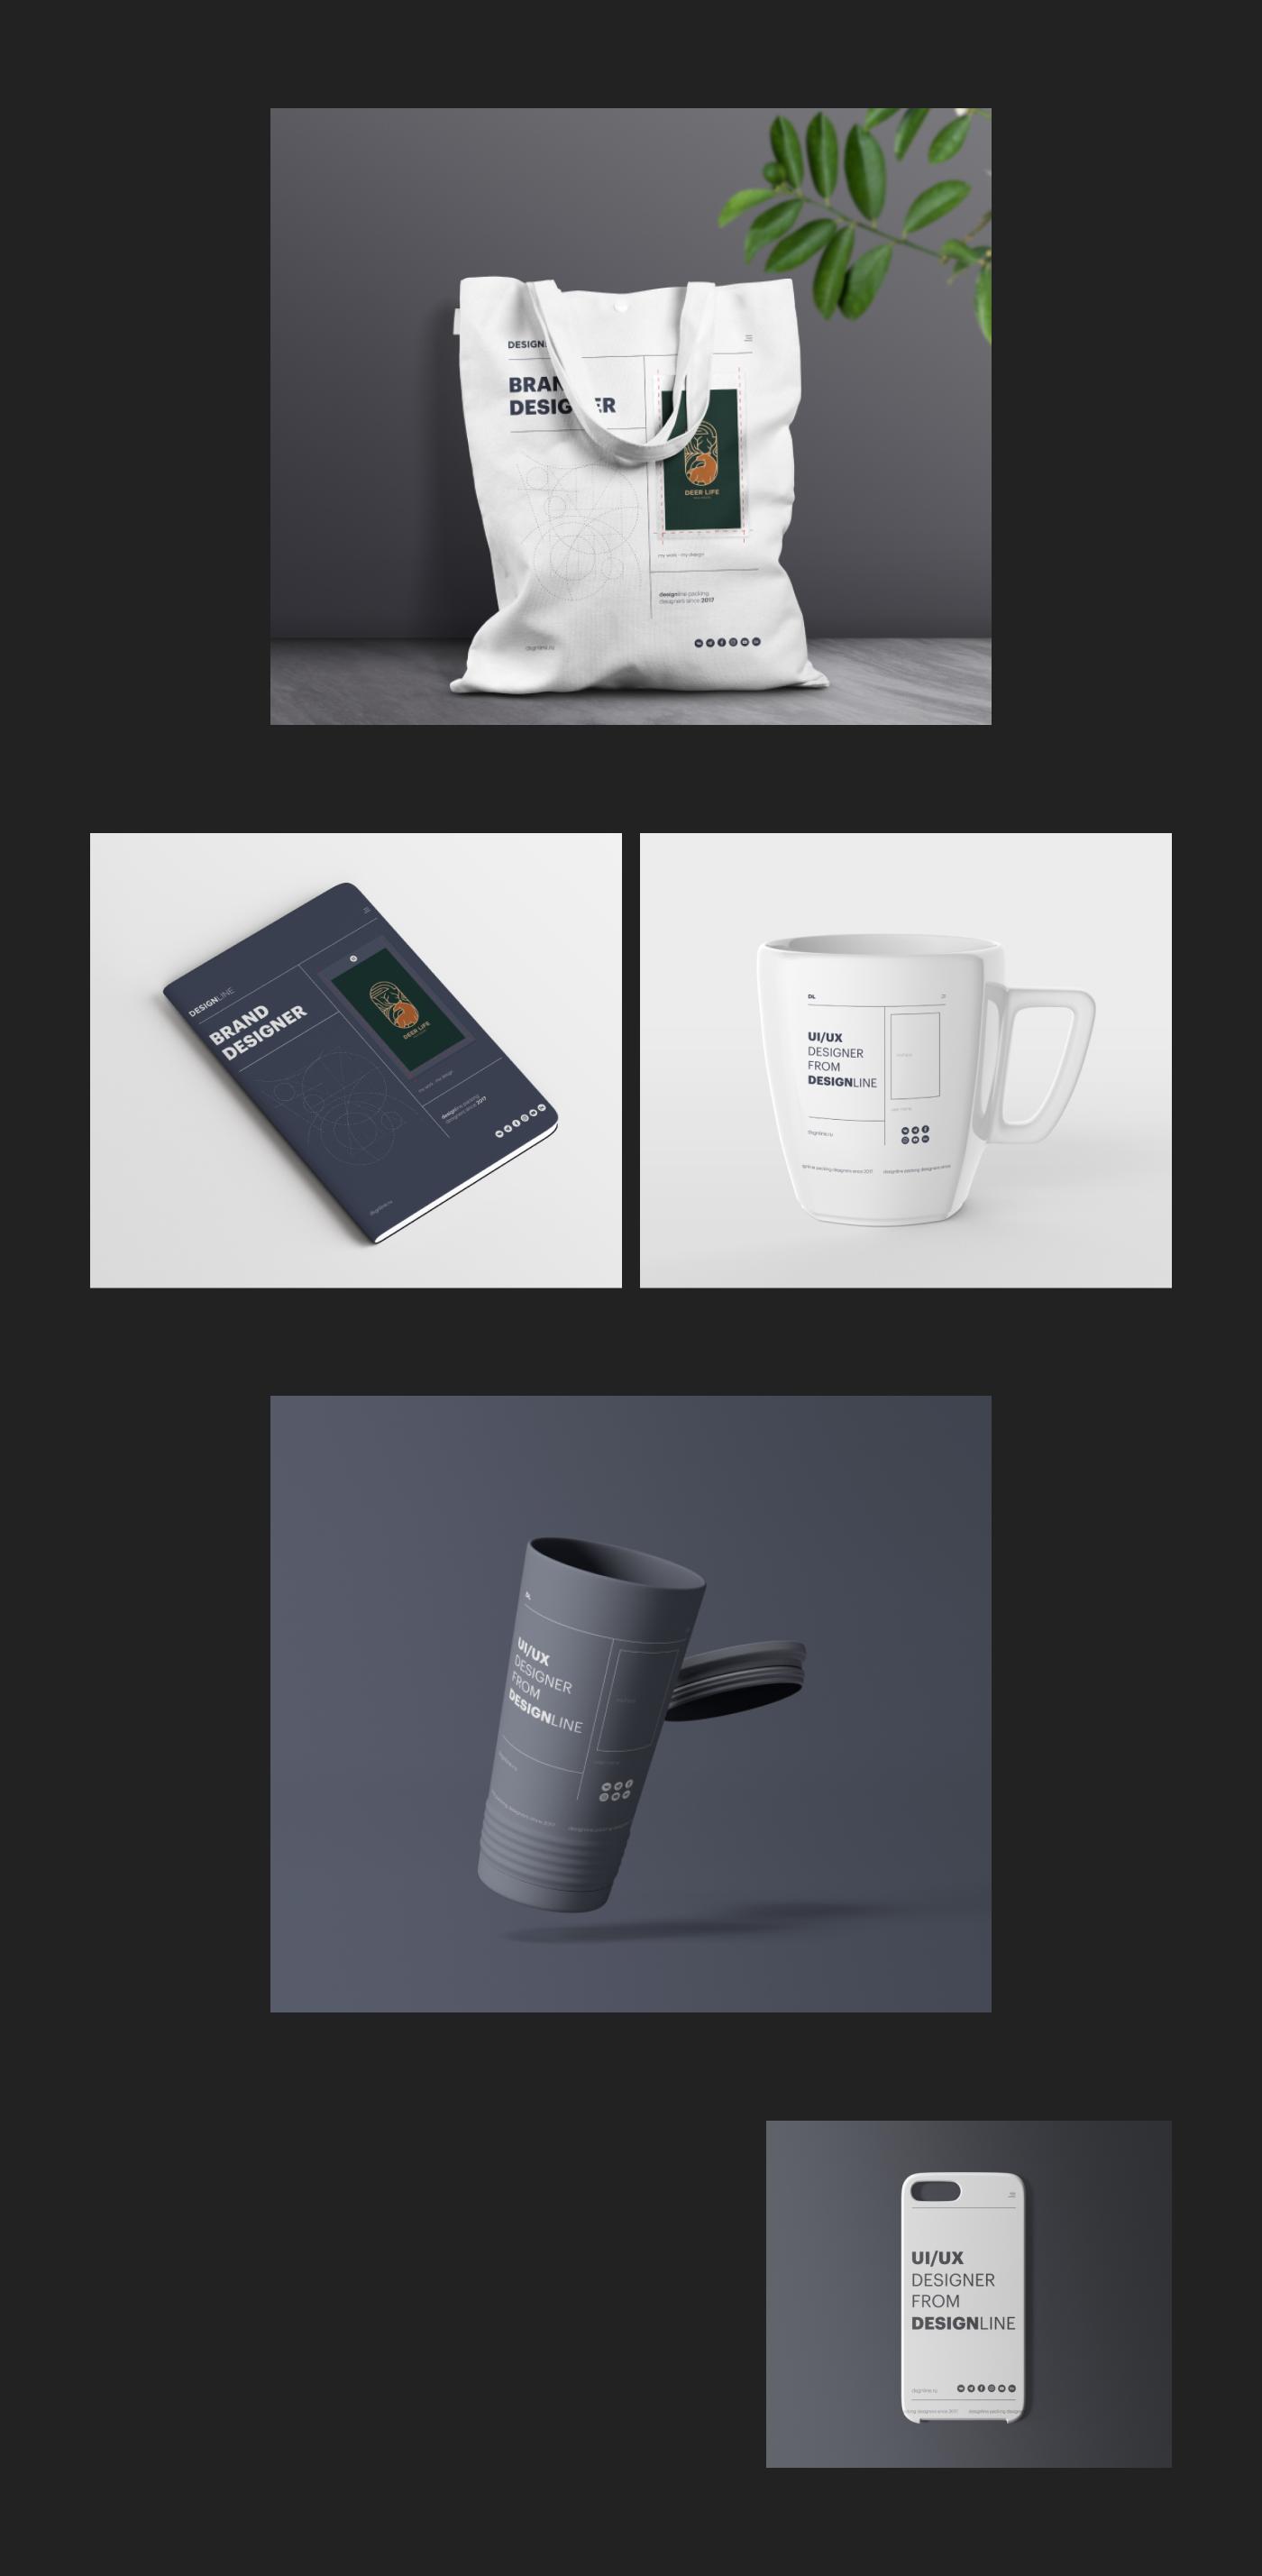 branding  creative designline dsgnlinegym graphic design  identity Merch